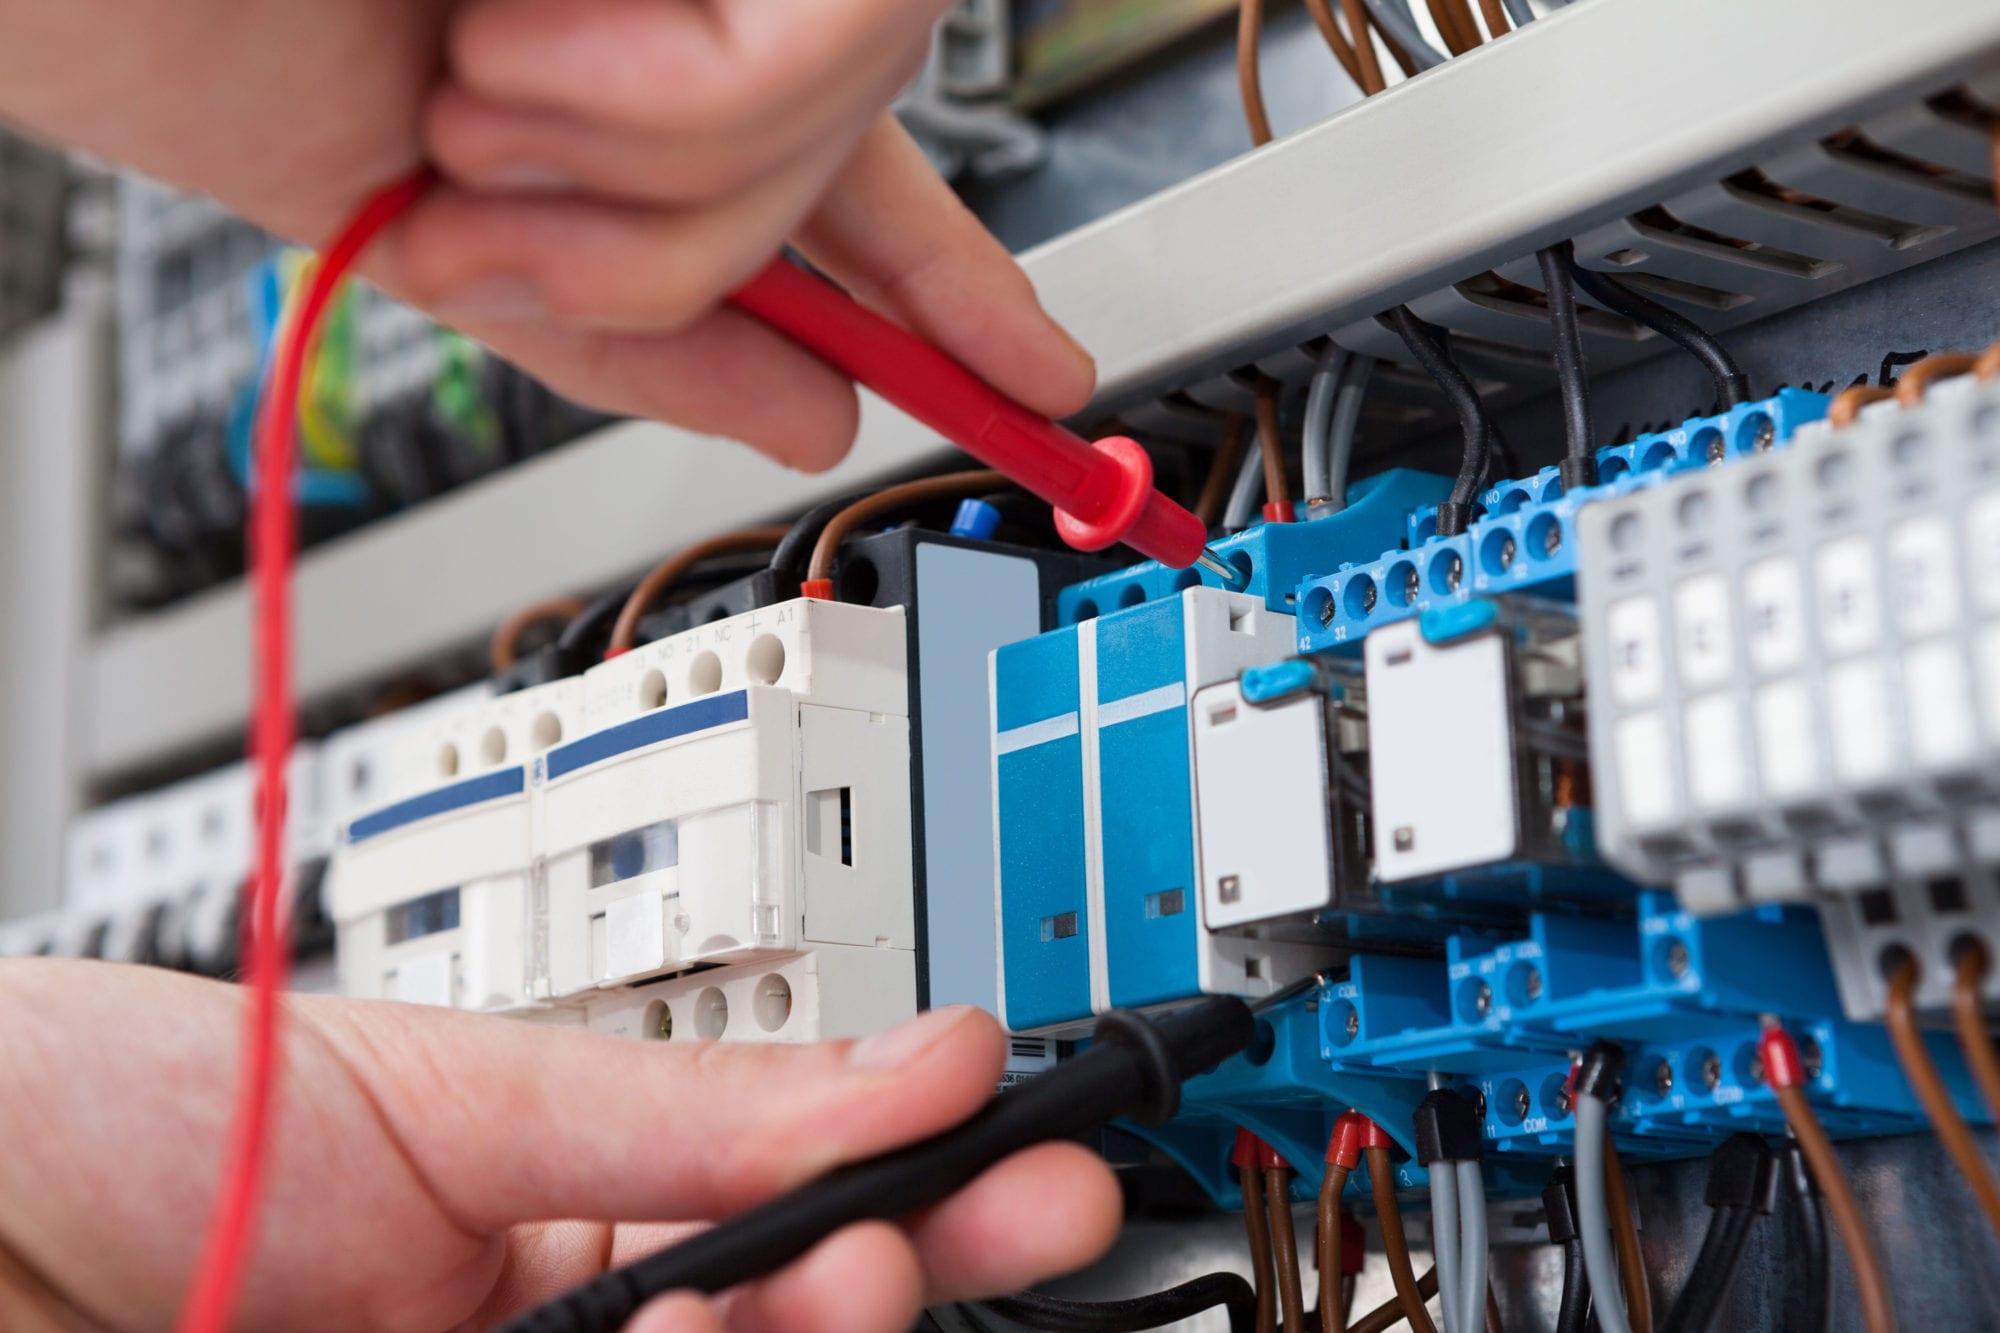 instalasi listrik (ma-developmentservices.co.uk)